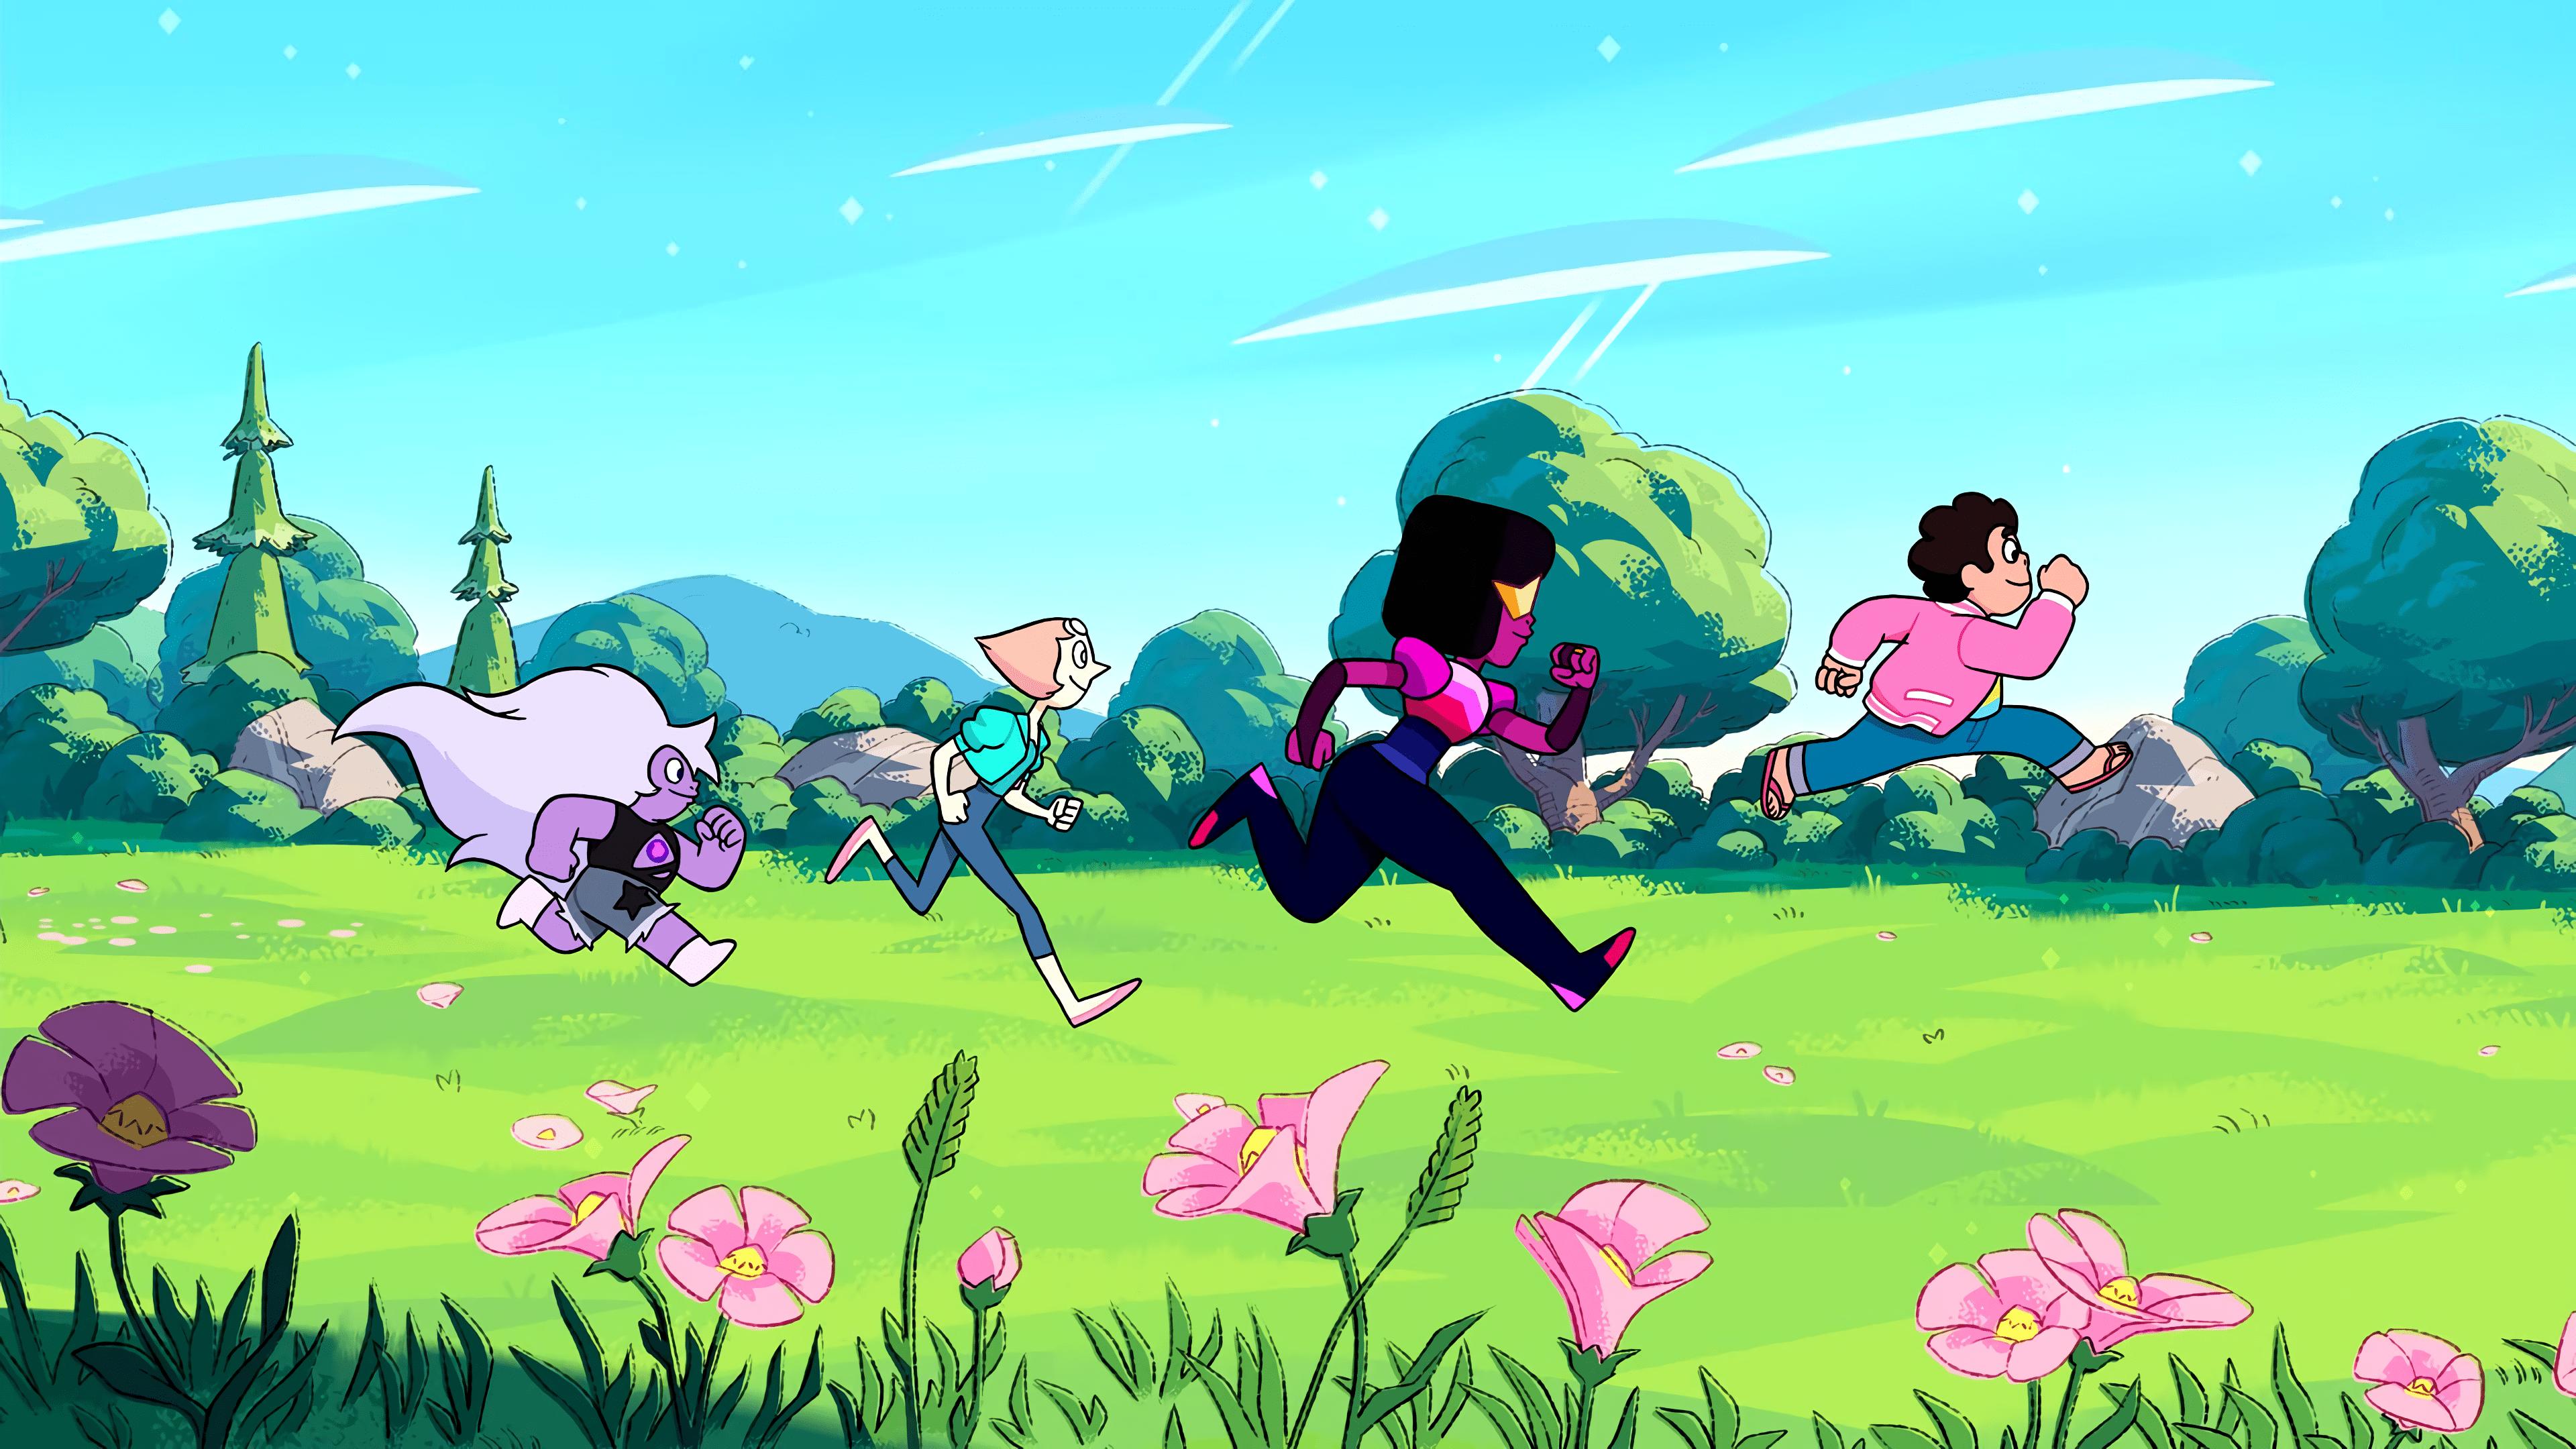 Steven Universe Future Wallpapers Top Free Steven Universe